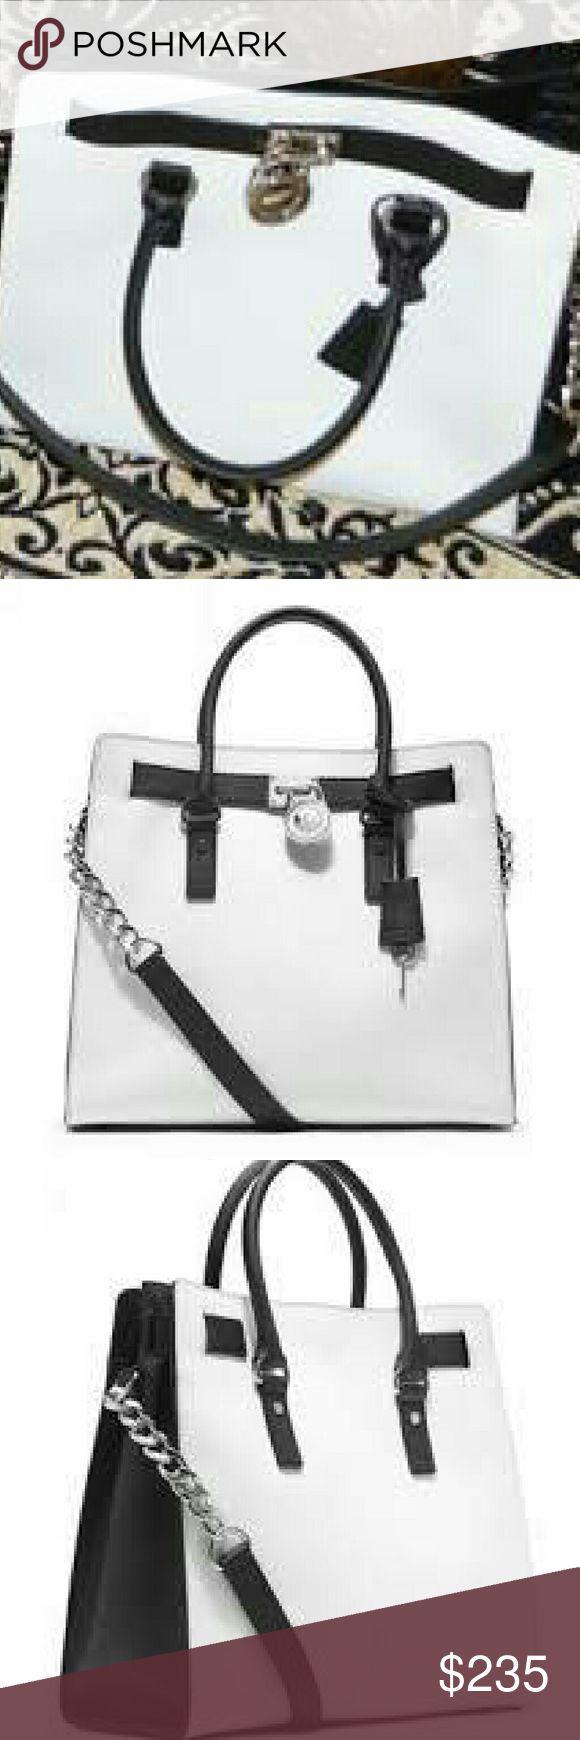 Michael Kors Hamilton Bag Large black and white Michael Kors Hamilton Bag Michael Kors Bags Shoulder Bags